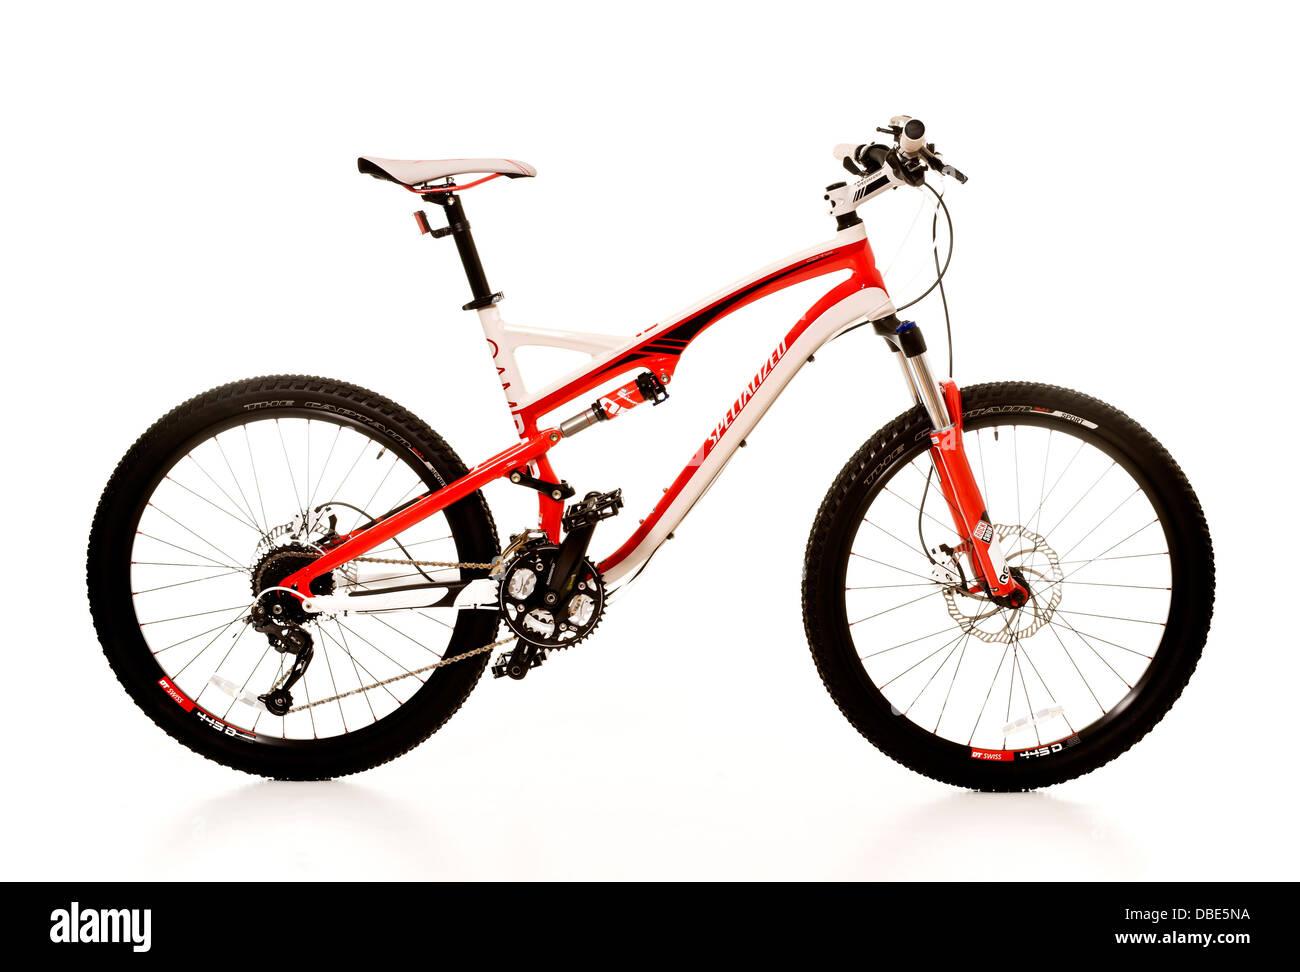 Studio shot of side view of a mountain bike. - Stock Image